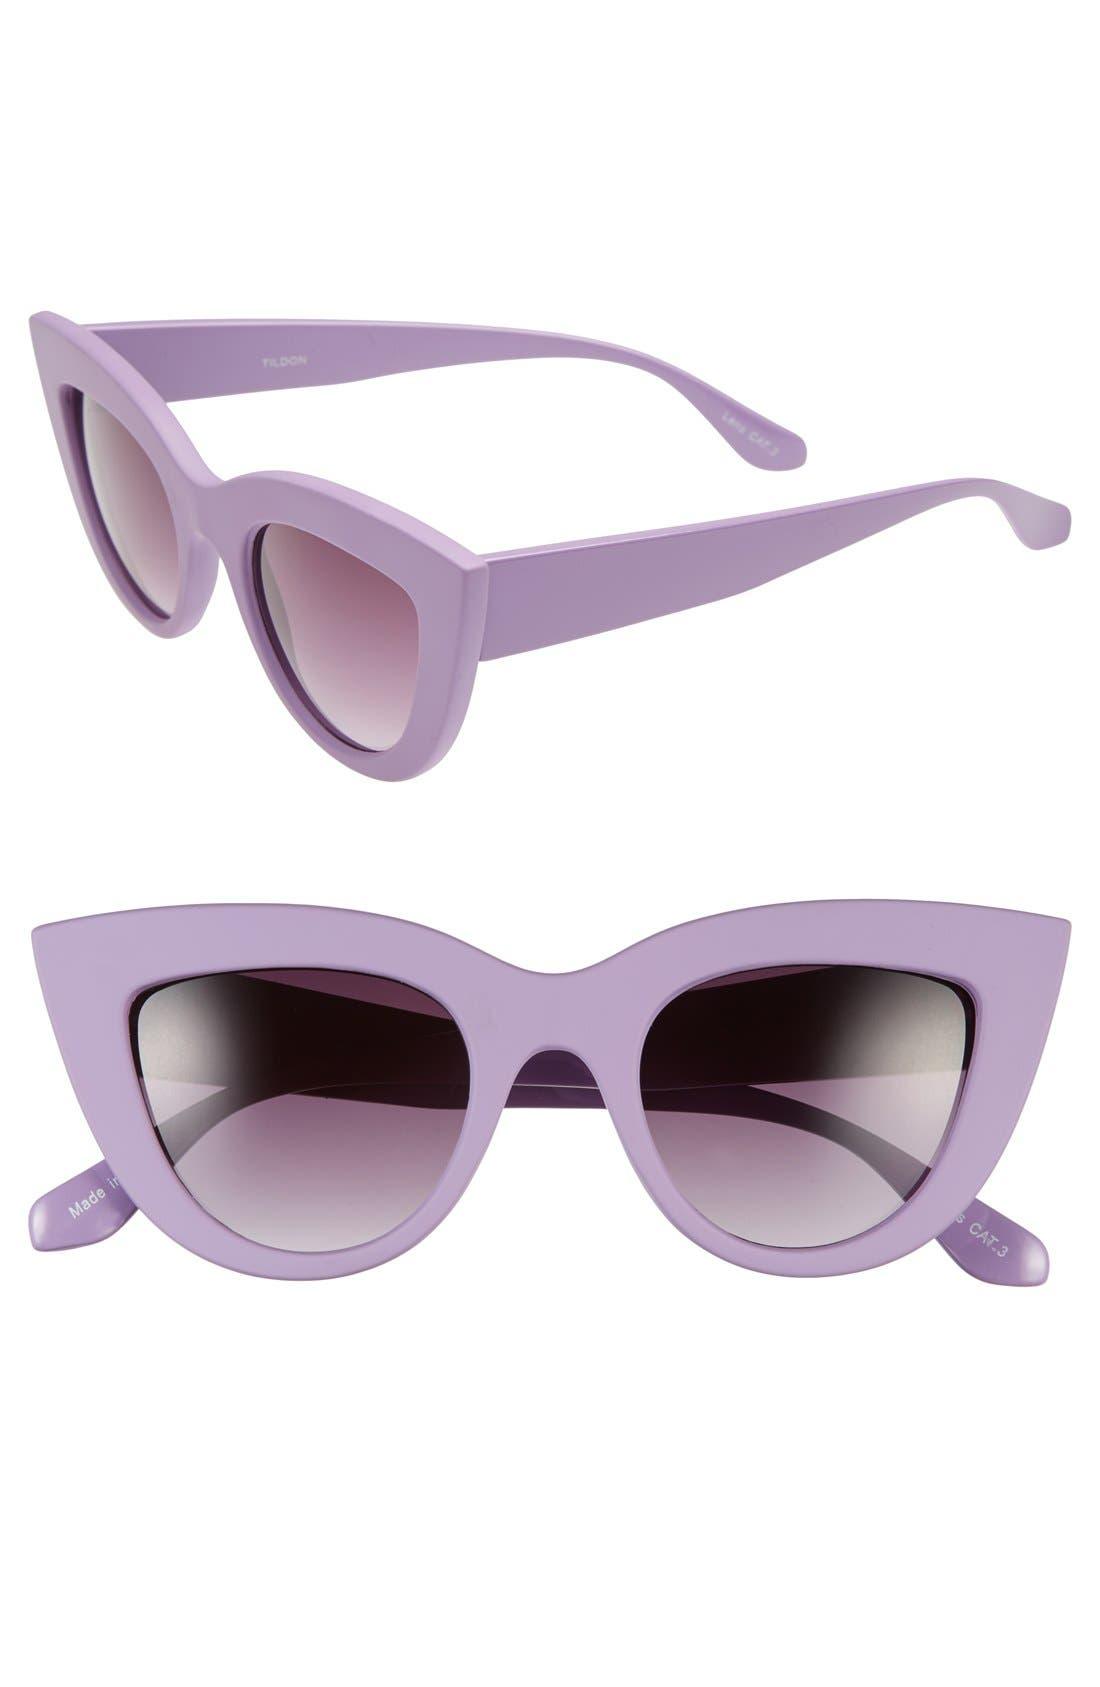 42mm Cat Eye Sunglasses,                         Main,                         color, Purple